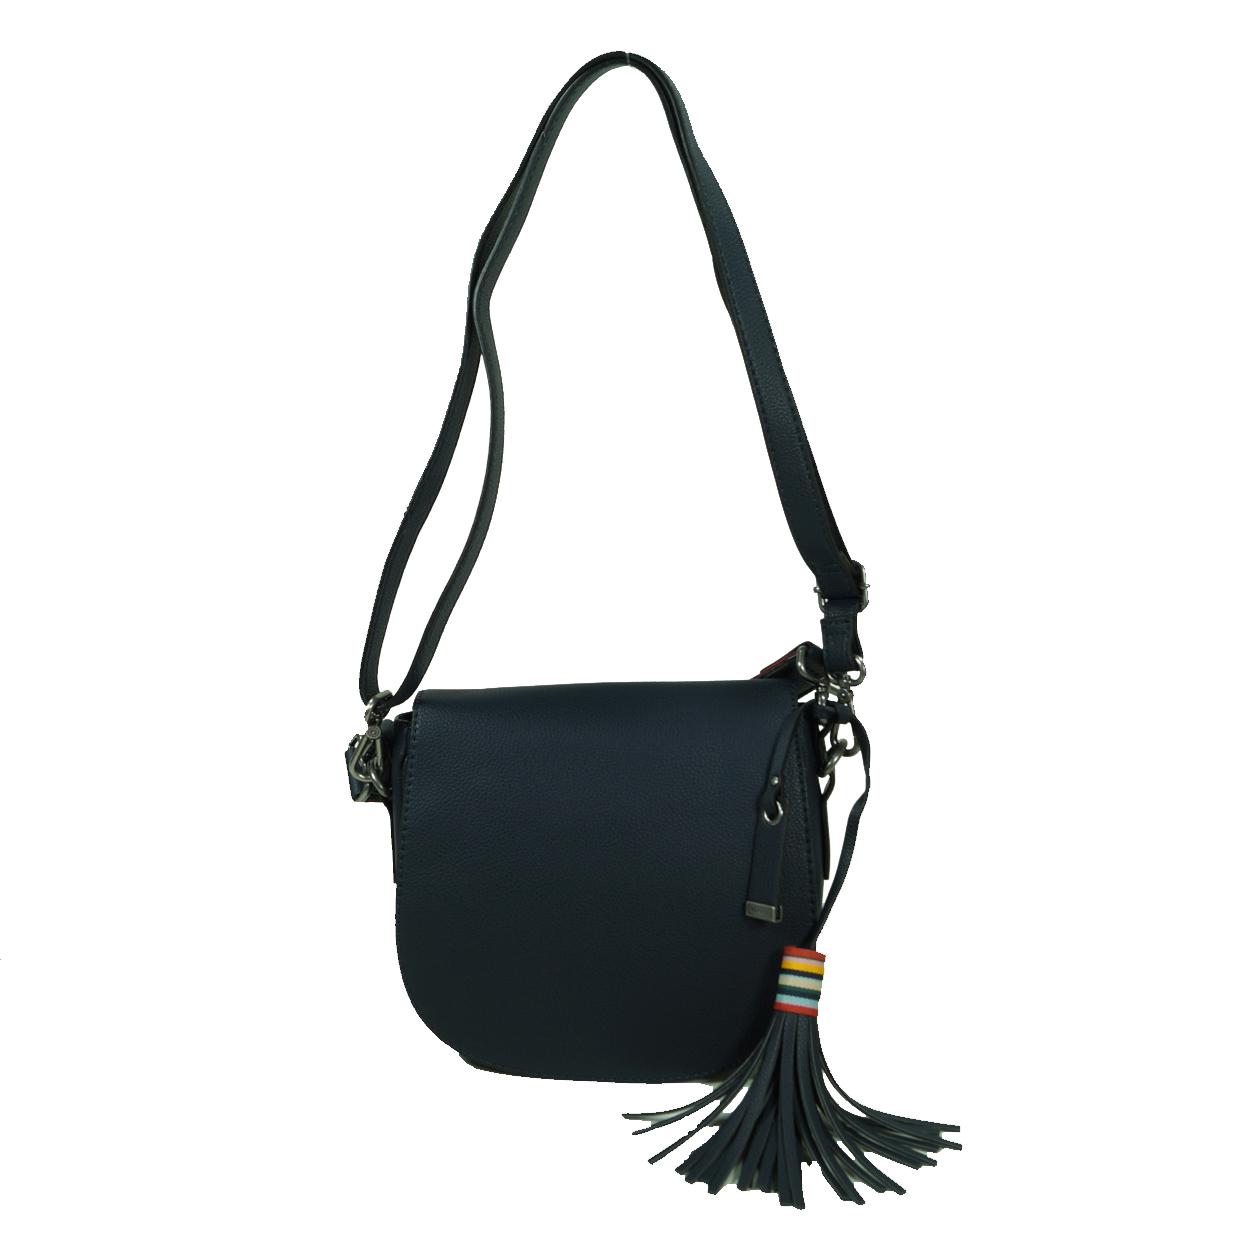 Esprit Wendy Saddlebag Blau Leder Handtasche Schulter Umhange Tasche